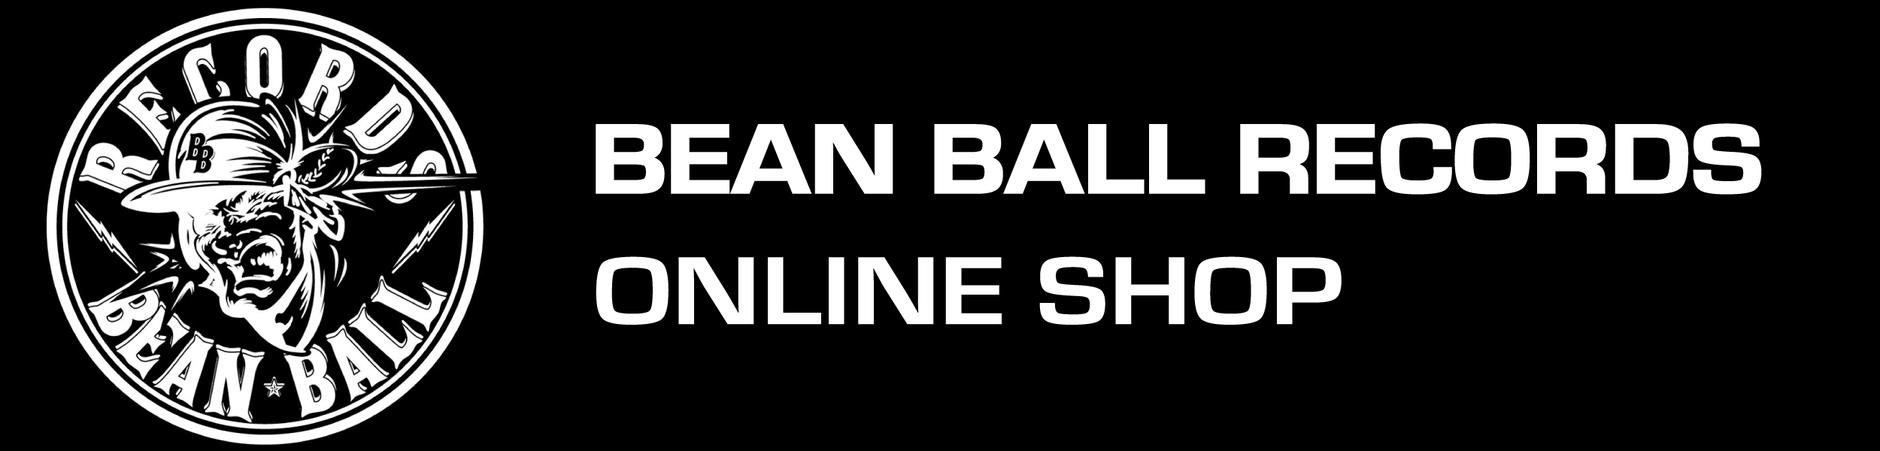 BEAN BALL RECORDS ONLINE SHOP